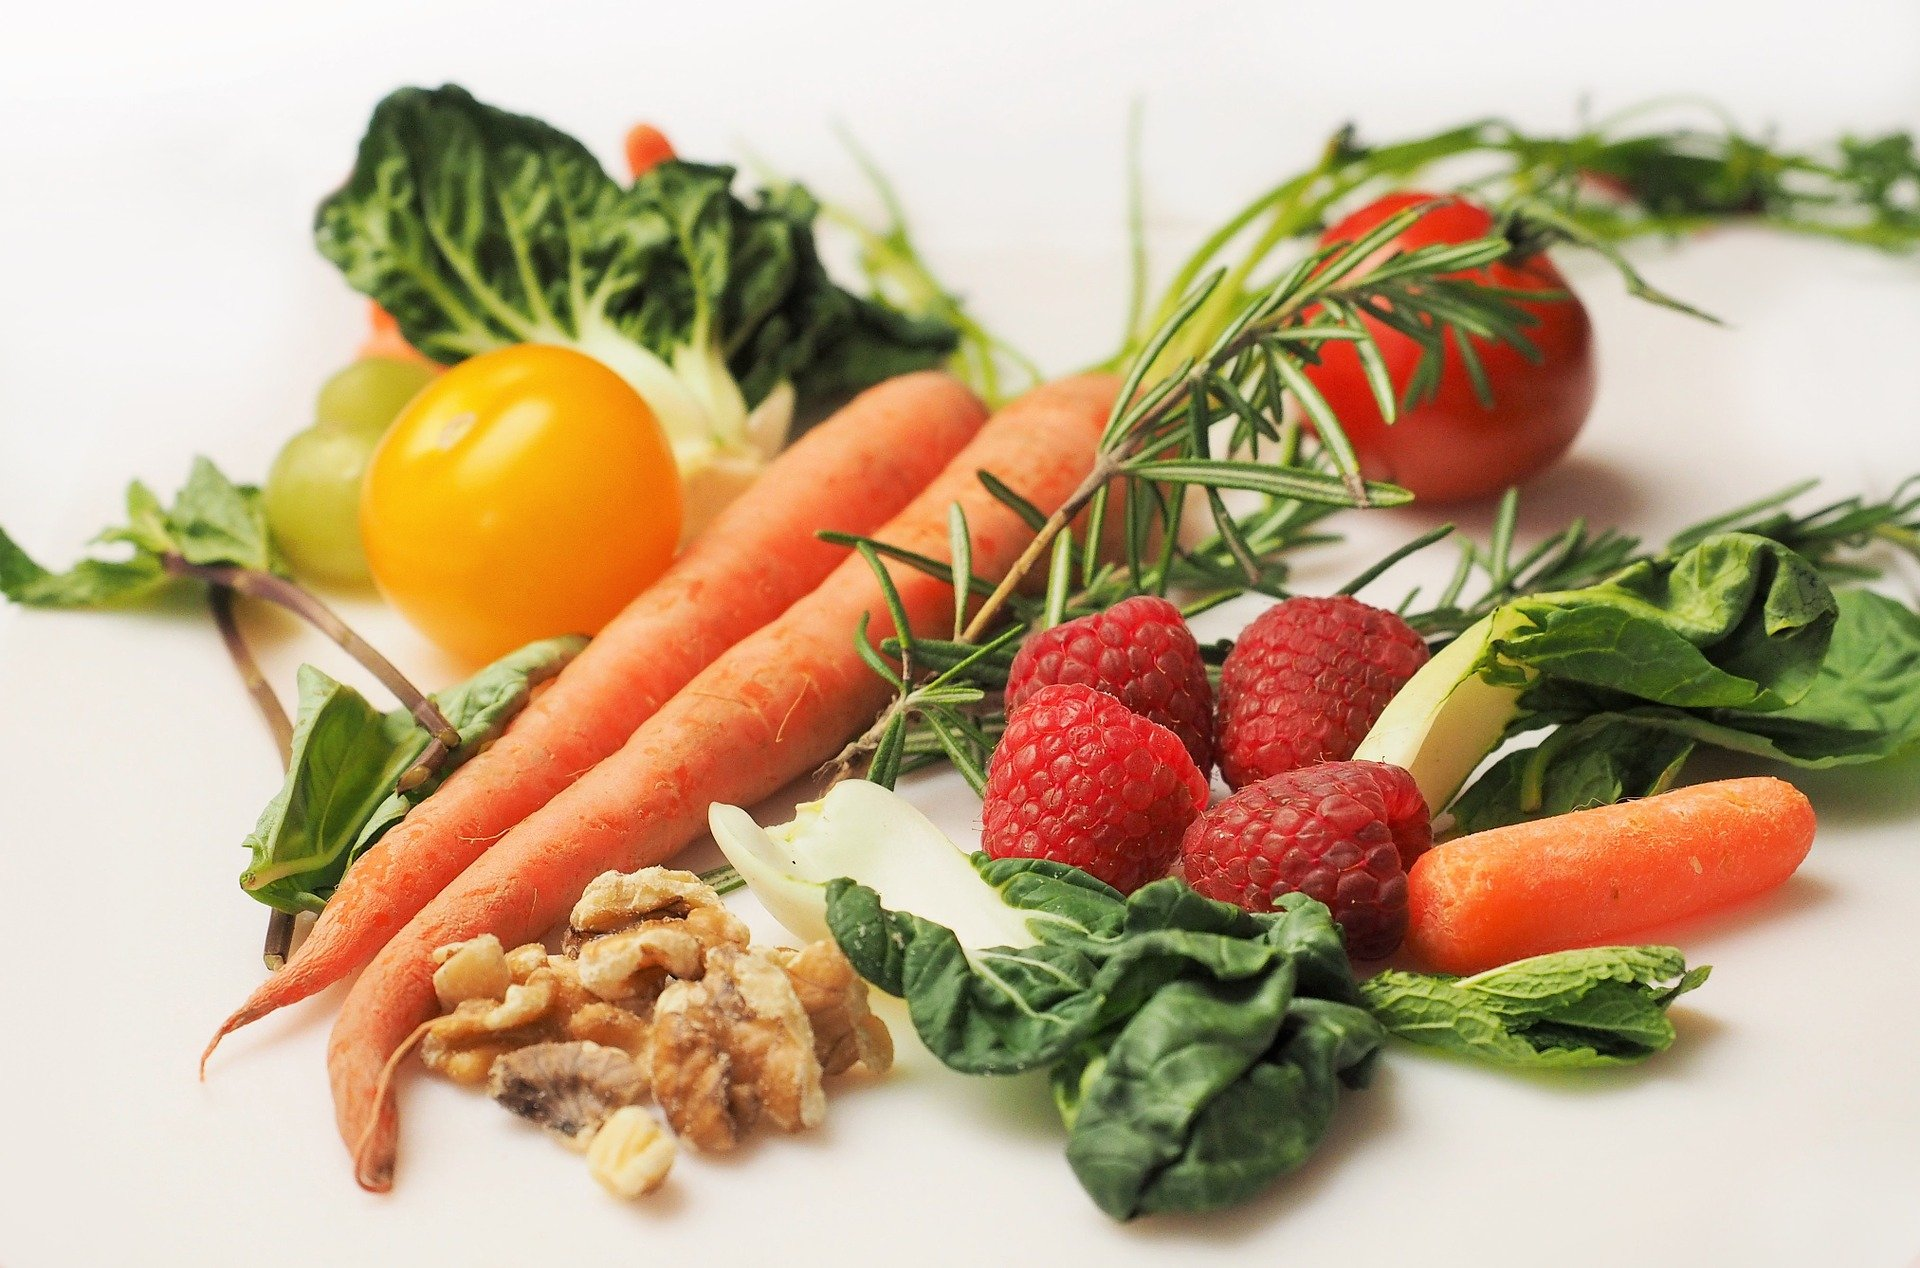 Healthy Food Stuffs